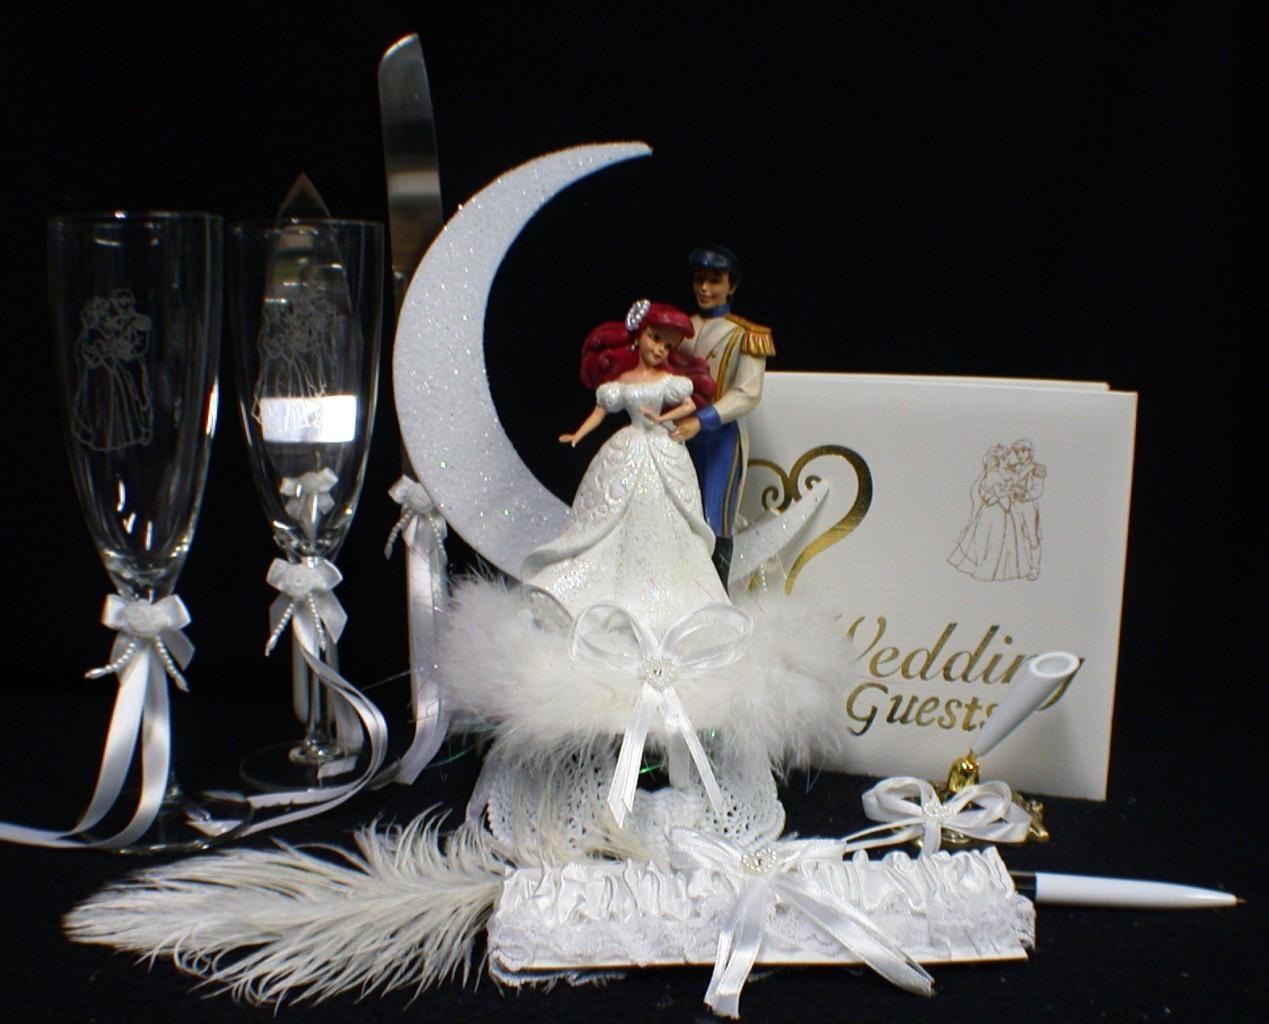 disney little mermaid wedding cake topper lot glasses knife server garter ariel wedding cake. Black Bedroom Furniture Sets. Home Design Ideas